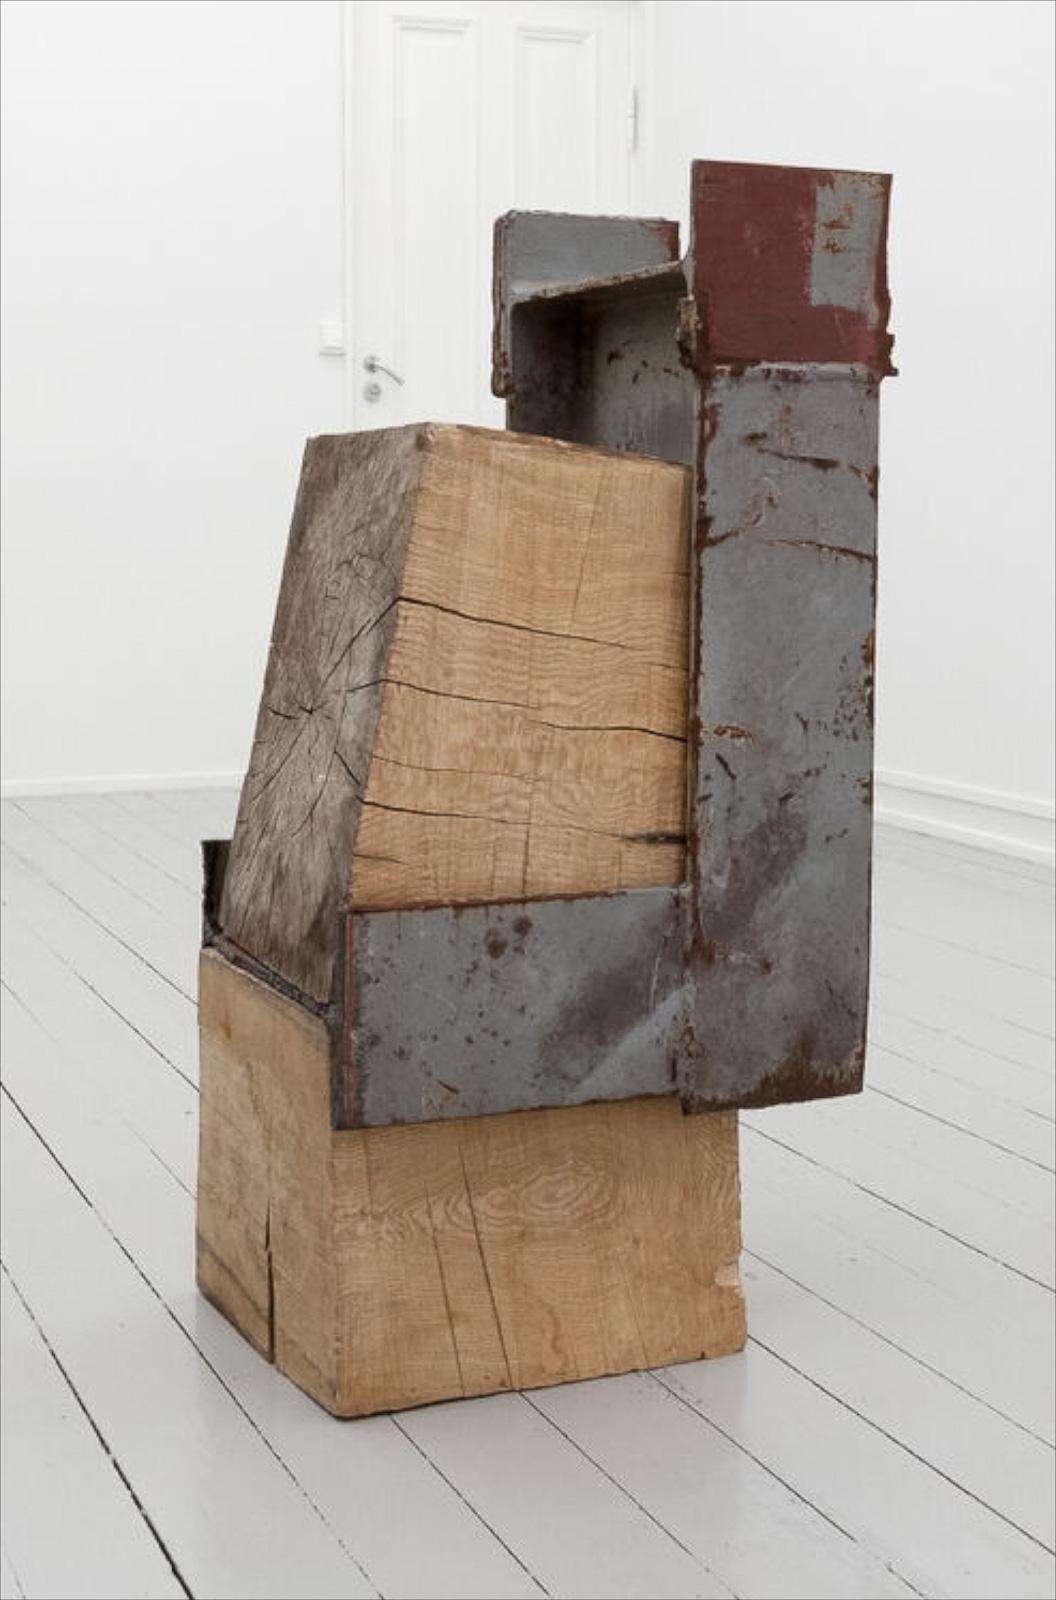 Sverre Wyller, Kolbu 8, 2017, Wood and steel, 112 x 55 x 50 cm